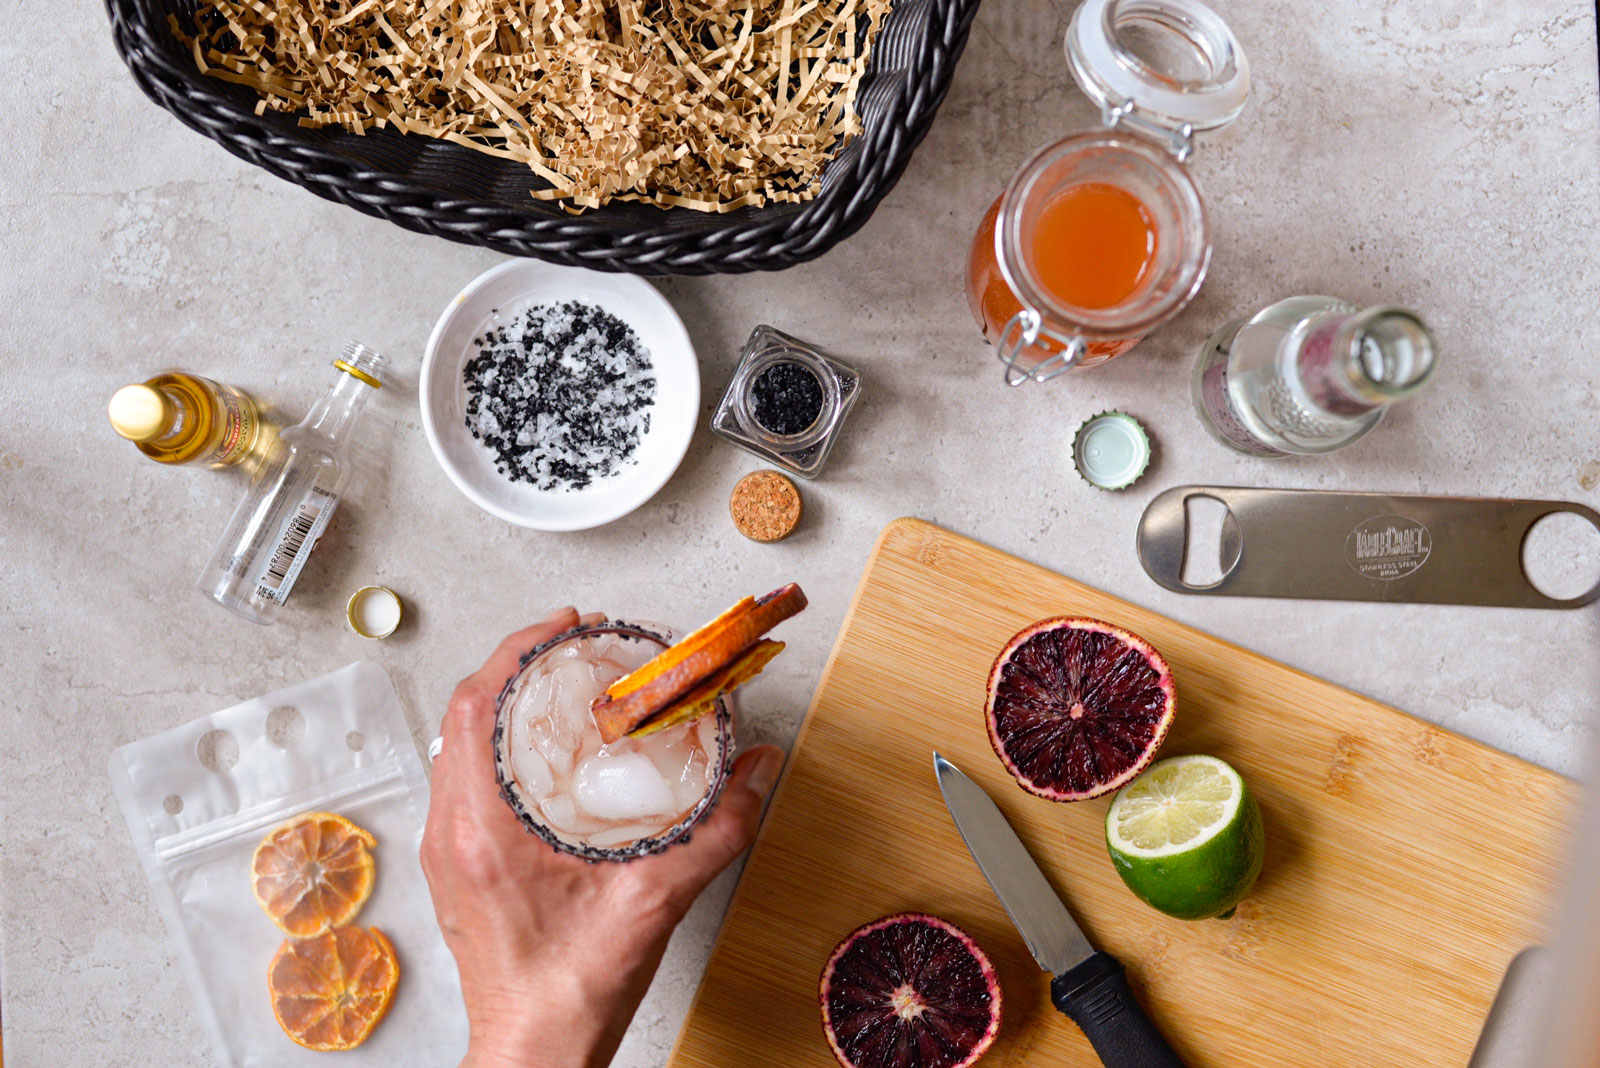 blood orange paloma cocktail from tablecraft recipe